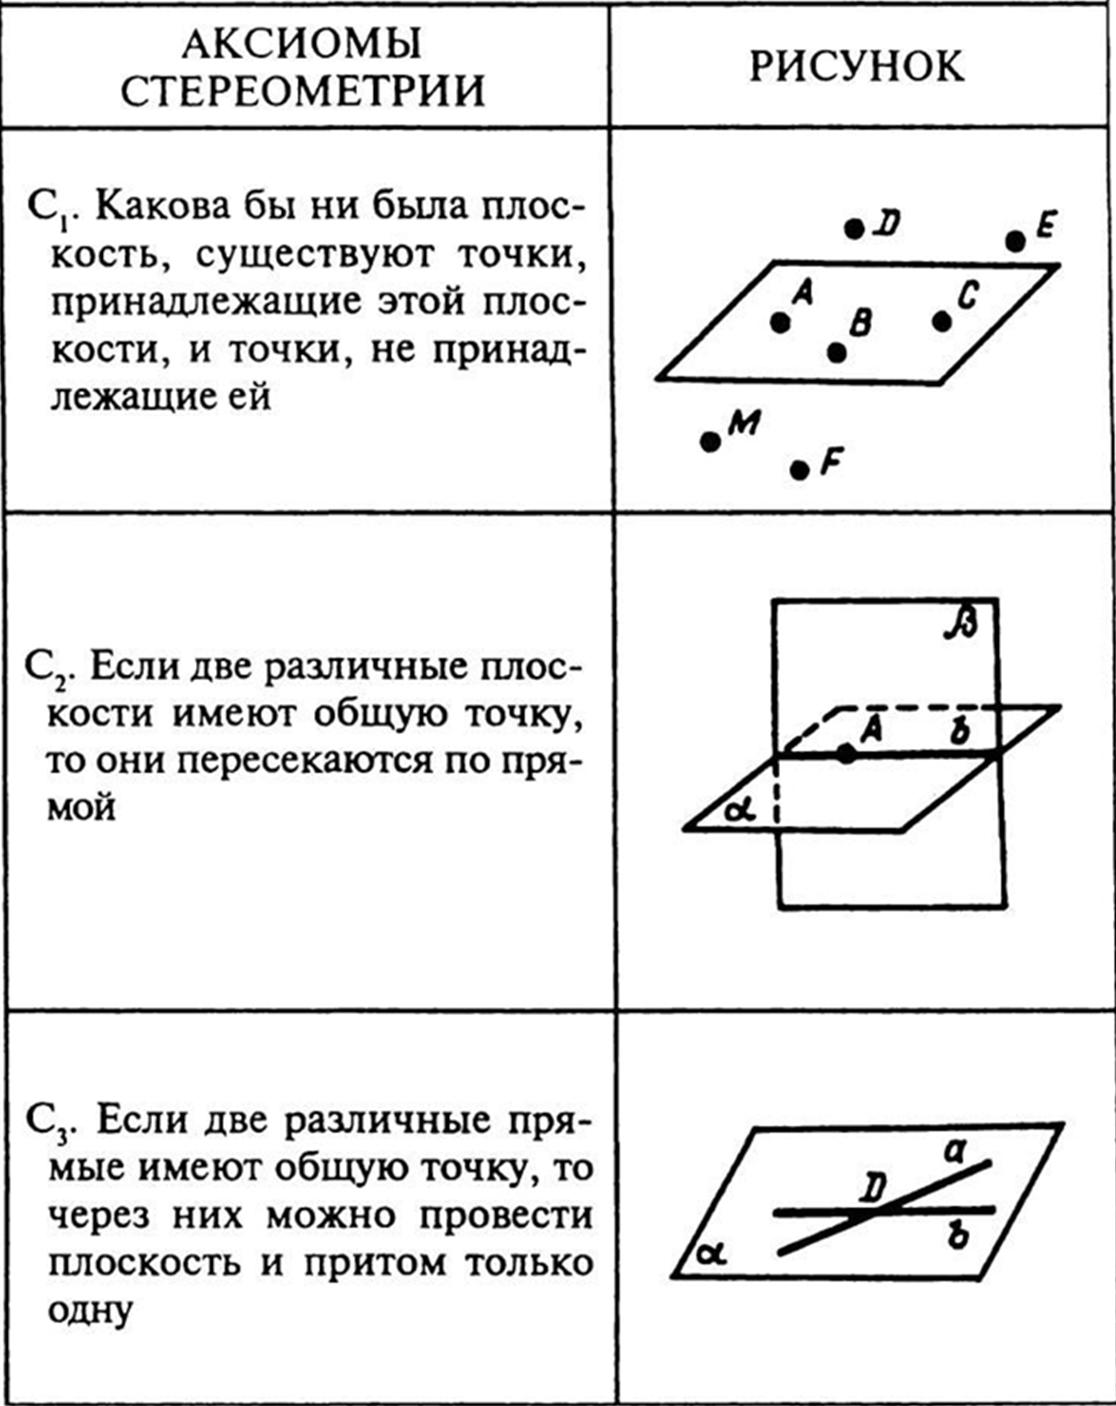 Аксиомы стереометрии с рисунком